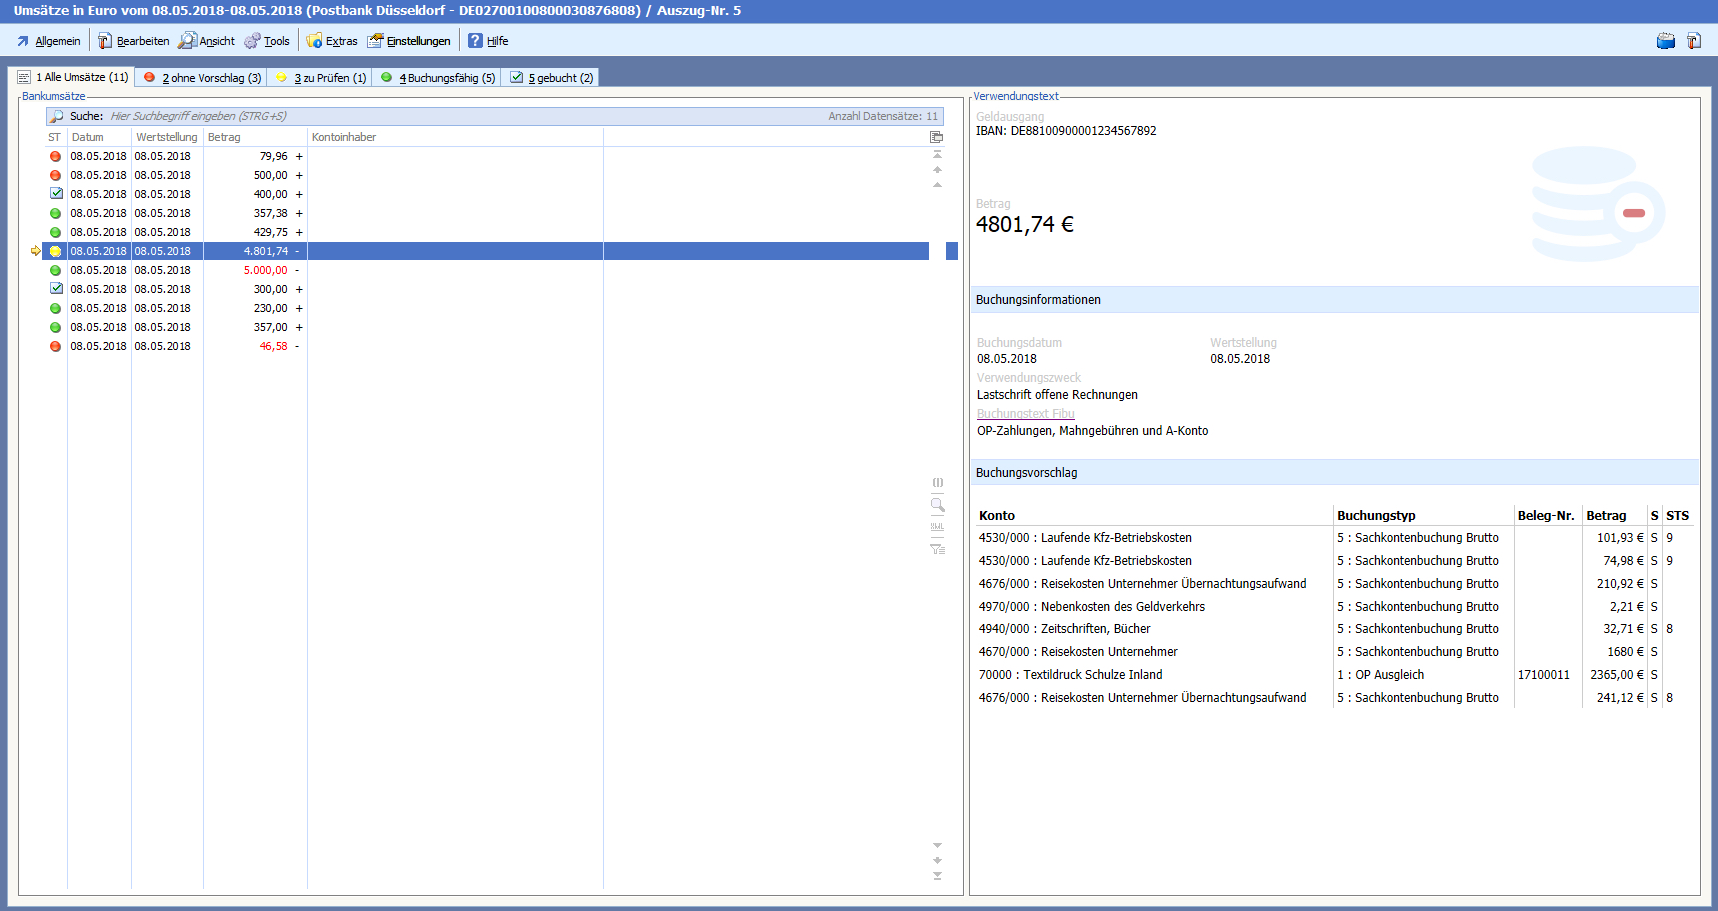 Screenshot vom intelligenten Buchungsassistenten der BüroWARE/WEBWARE - Ampelsystem - Bankauszug bearbeiten